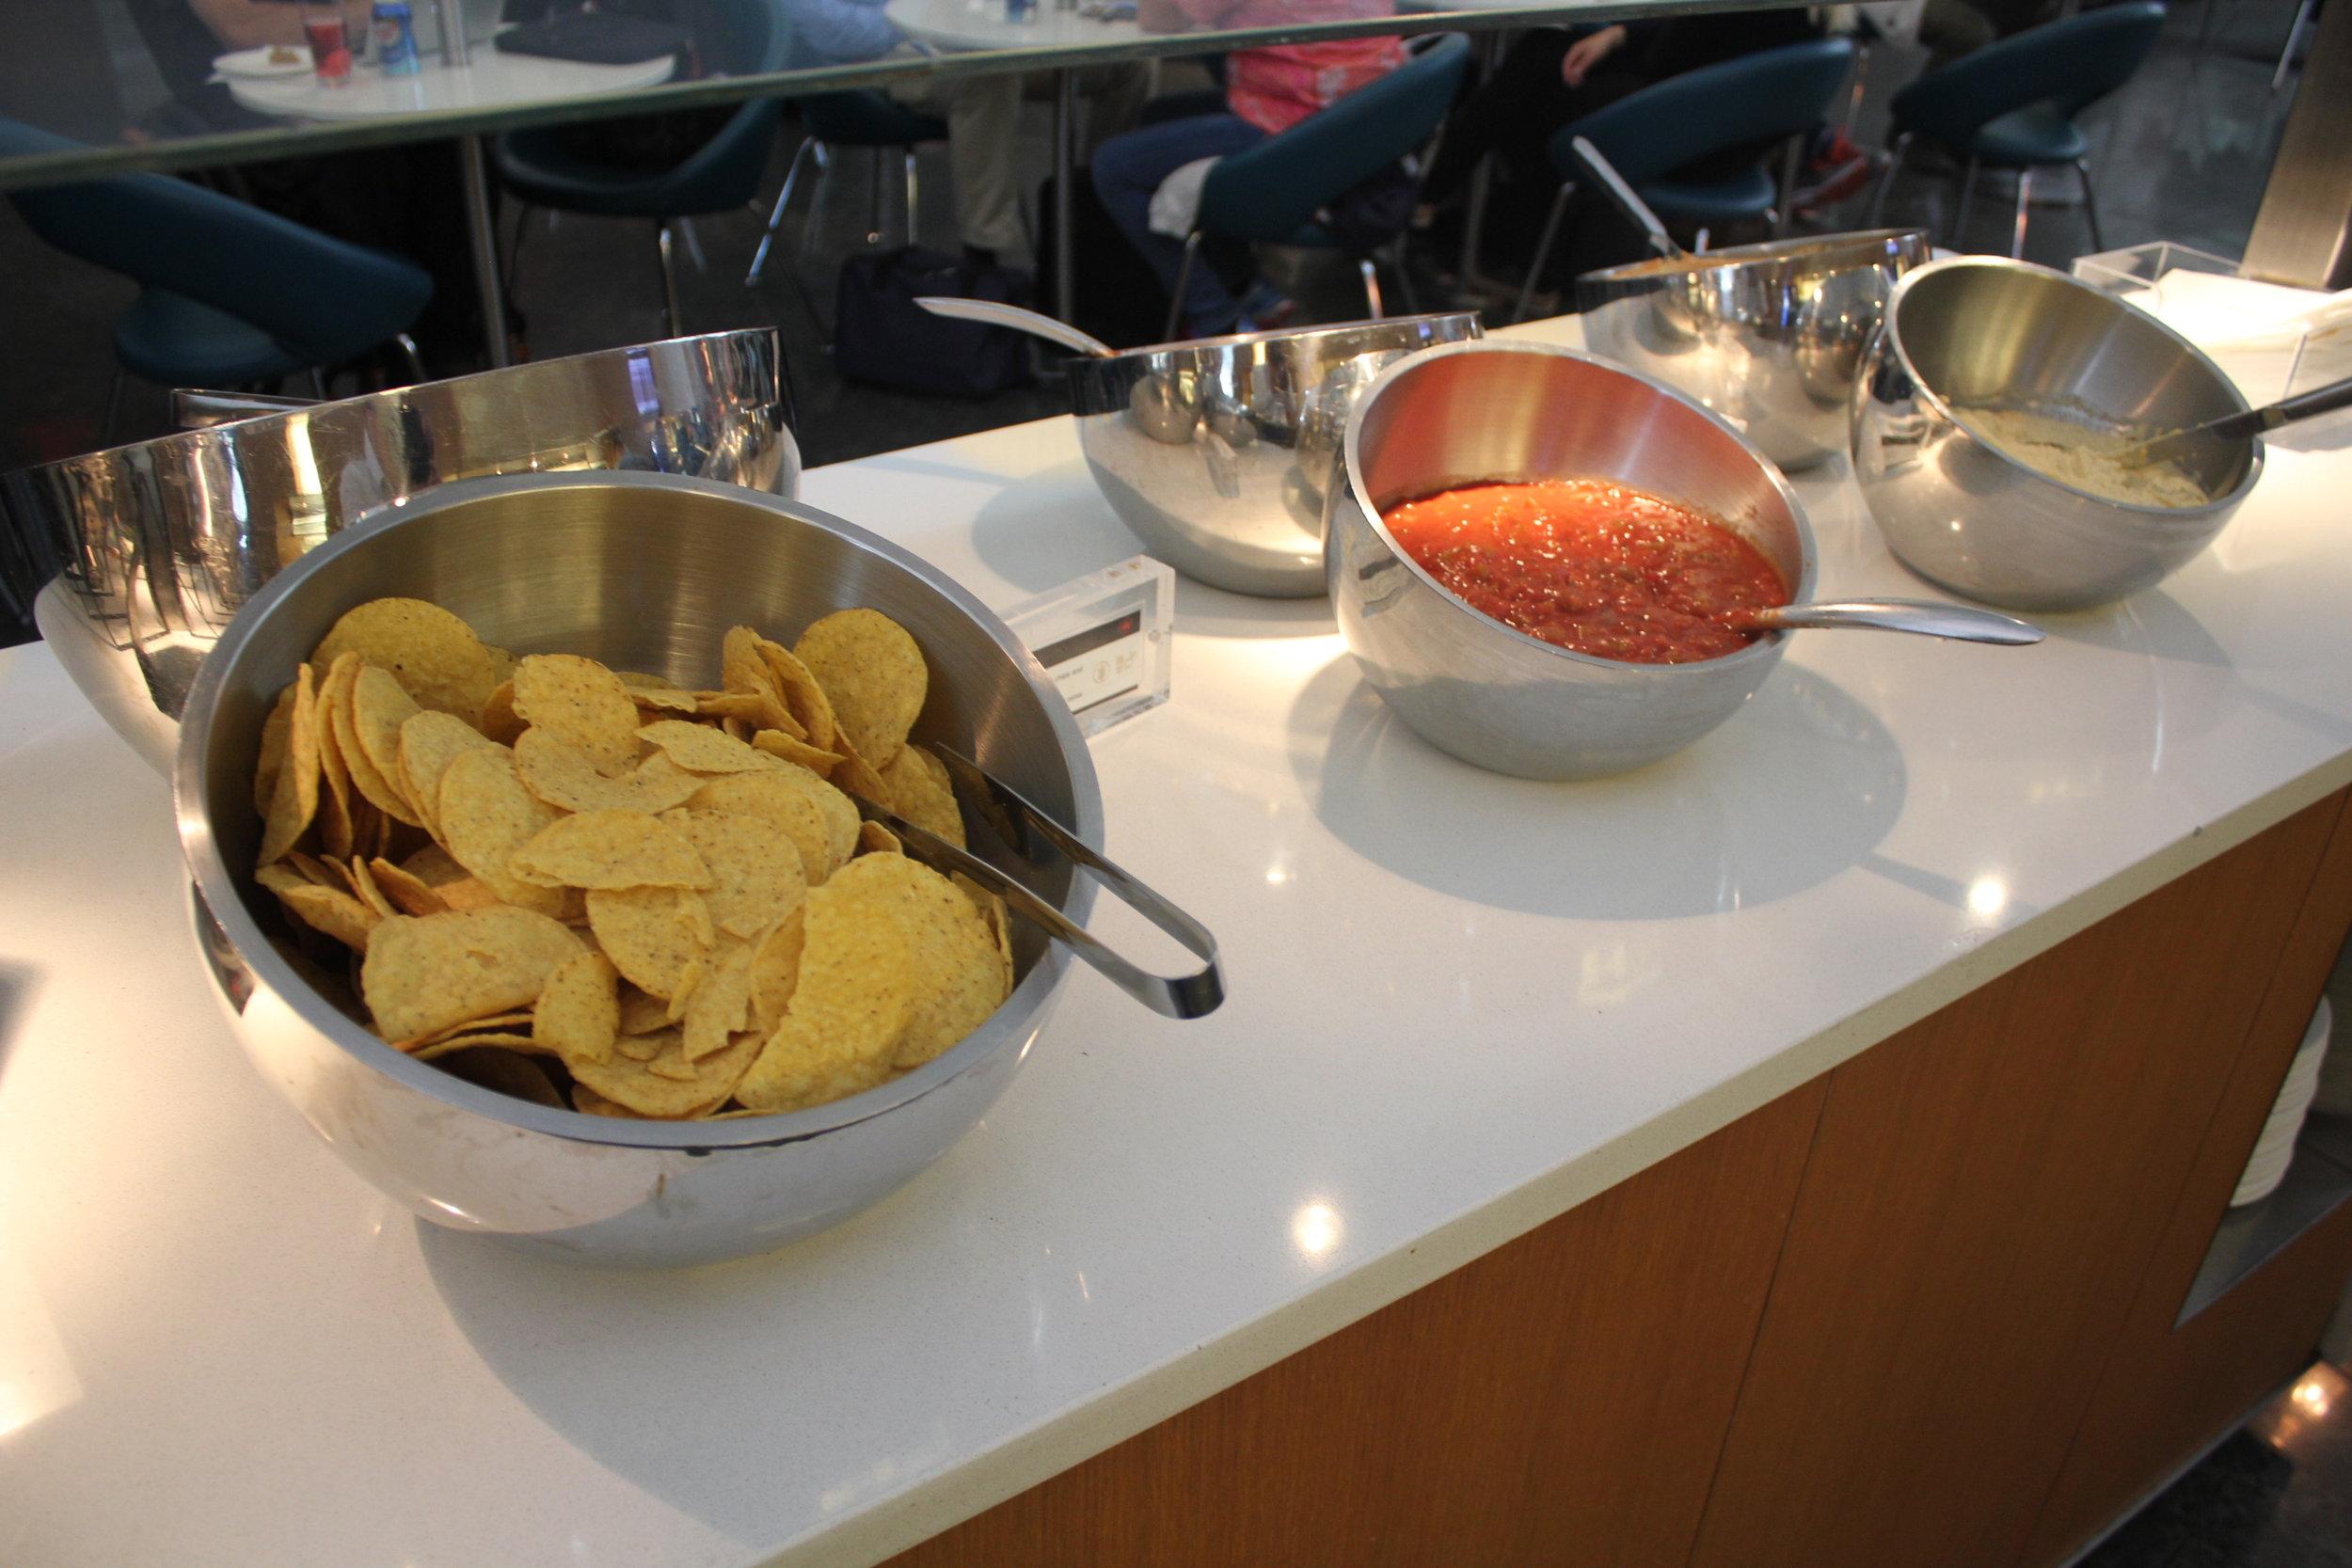 Air Canada Maple Leaf Lounge Toronto (International) – Tortilla chips